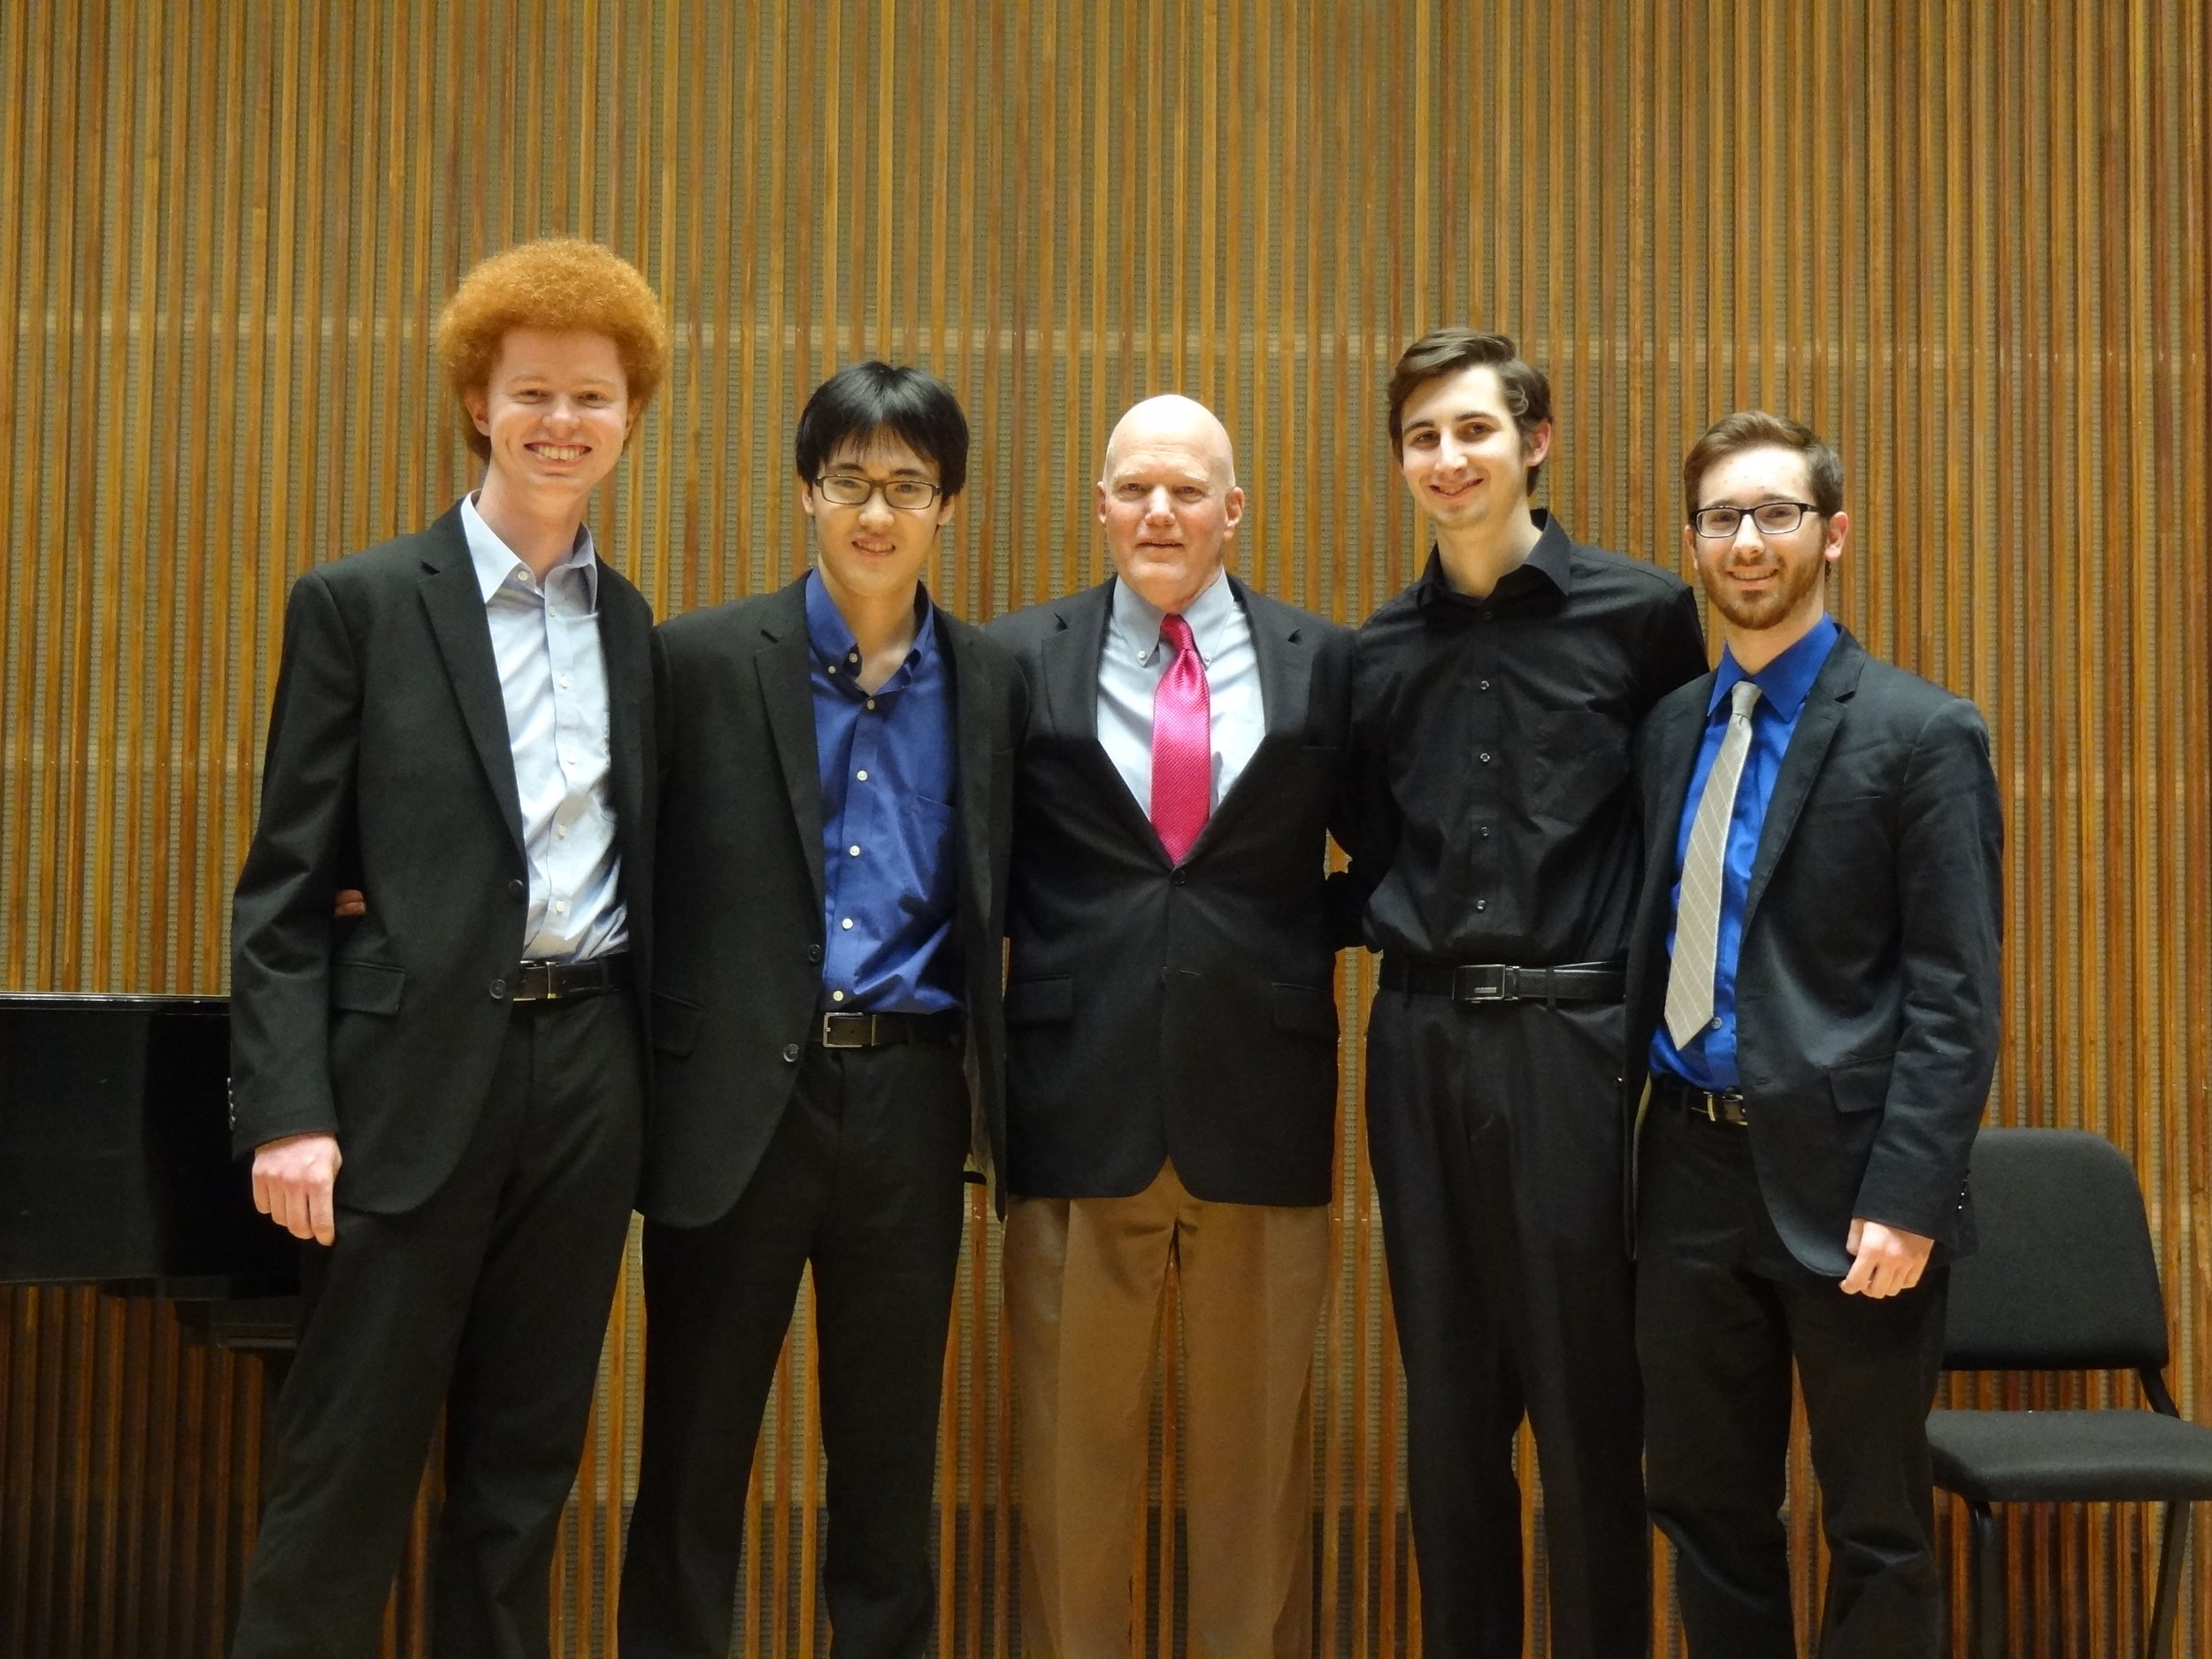 Andrew Poxon (1st), Yeram Yoon (2nd), James Stroud, Adam Sutorius (4th) and Brian King (3rd)